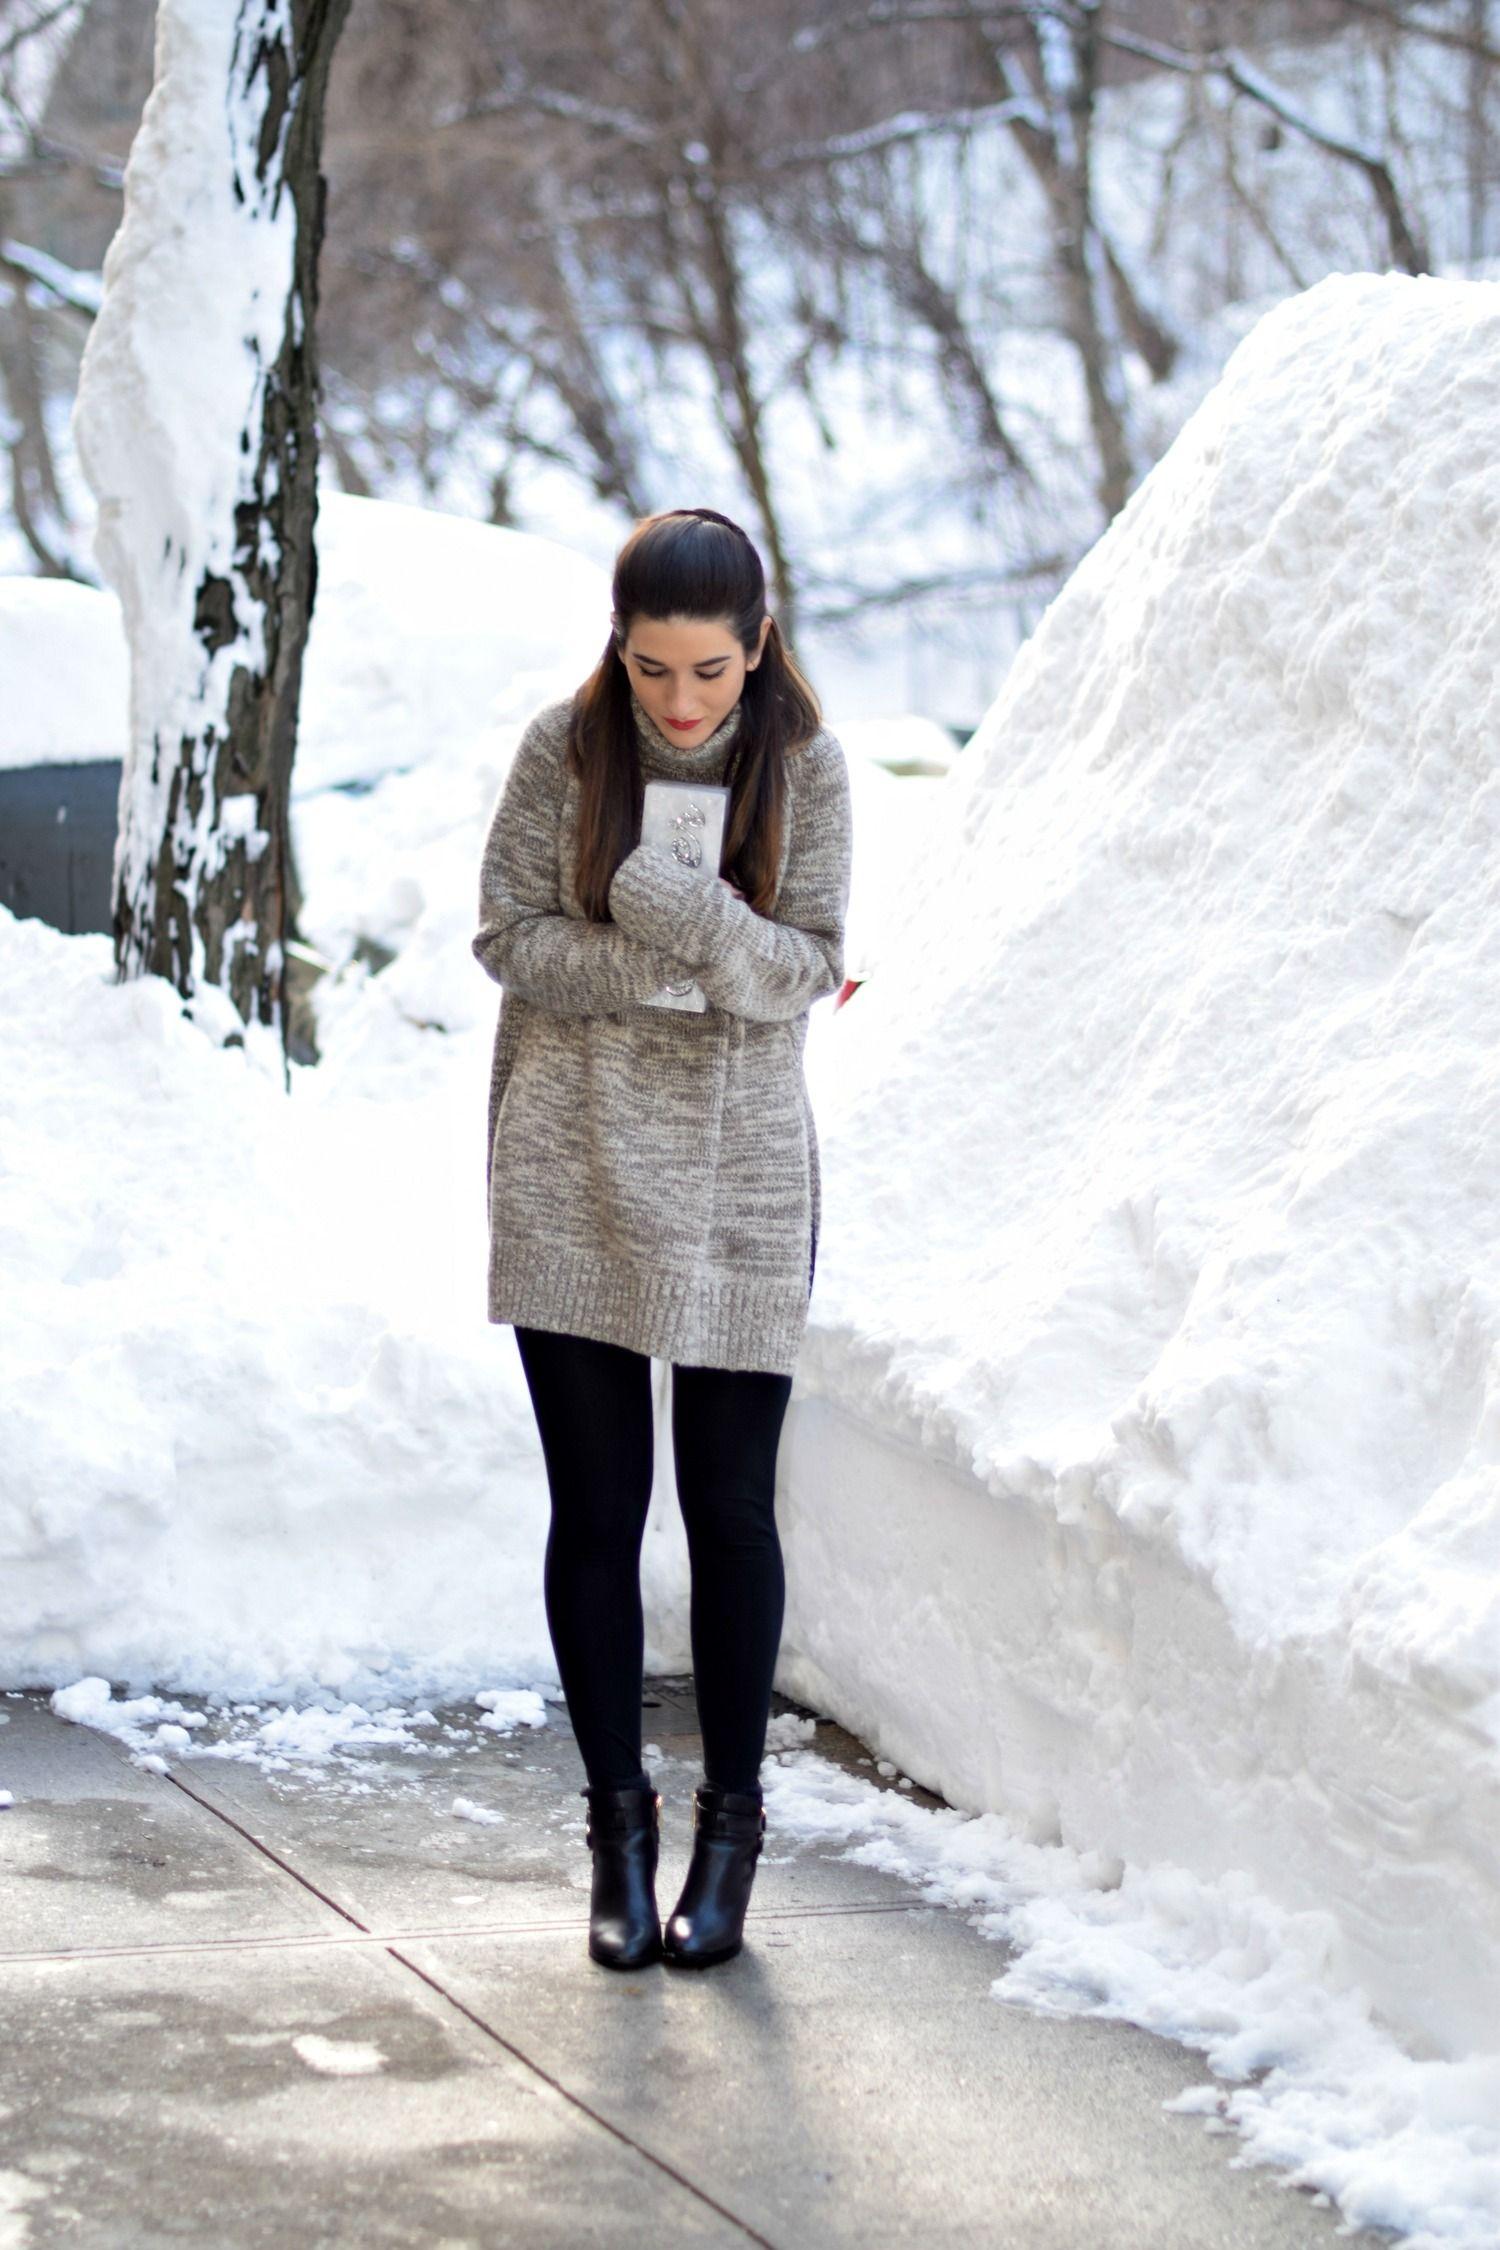 Grey Turtleneck + Leggings // Louboutins & Love Fashion Blog by Esther Santer